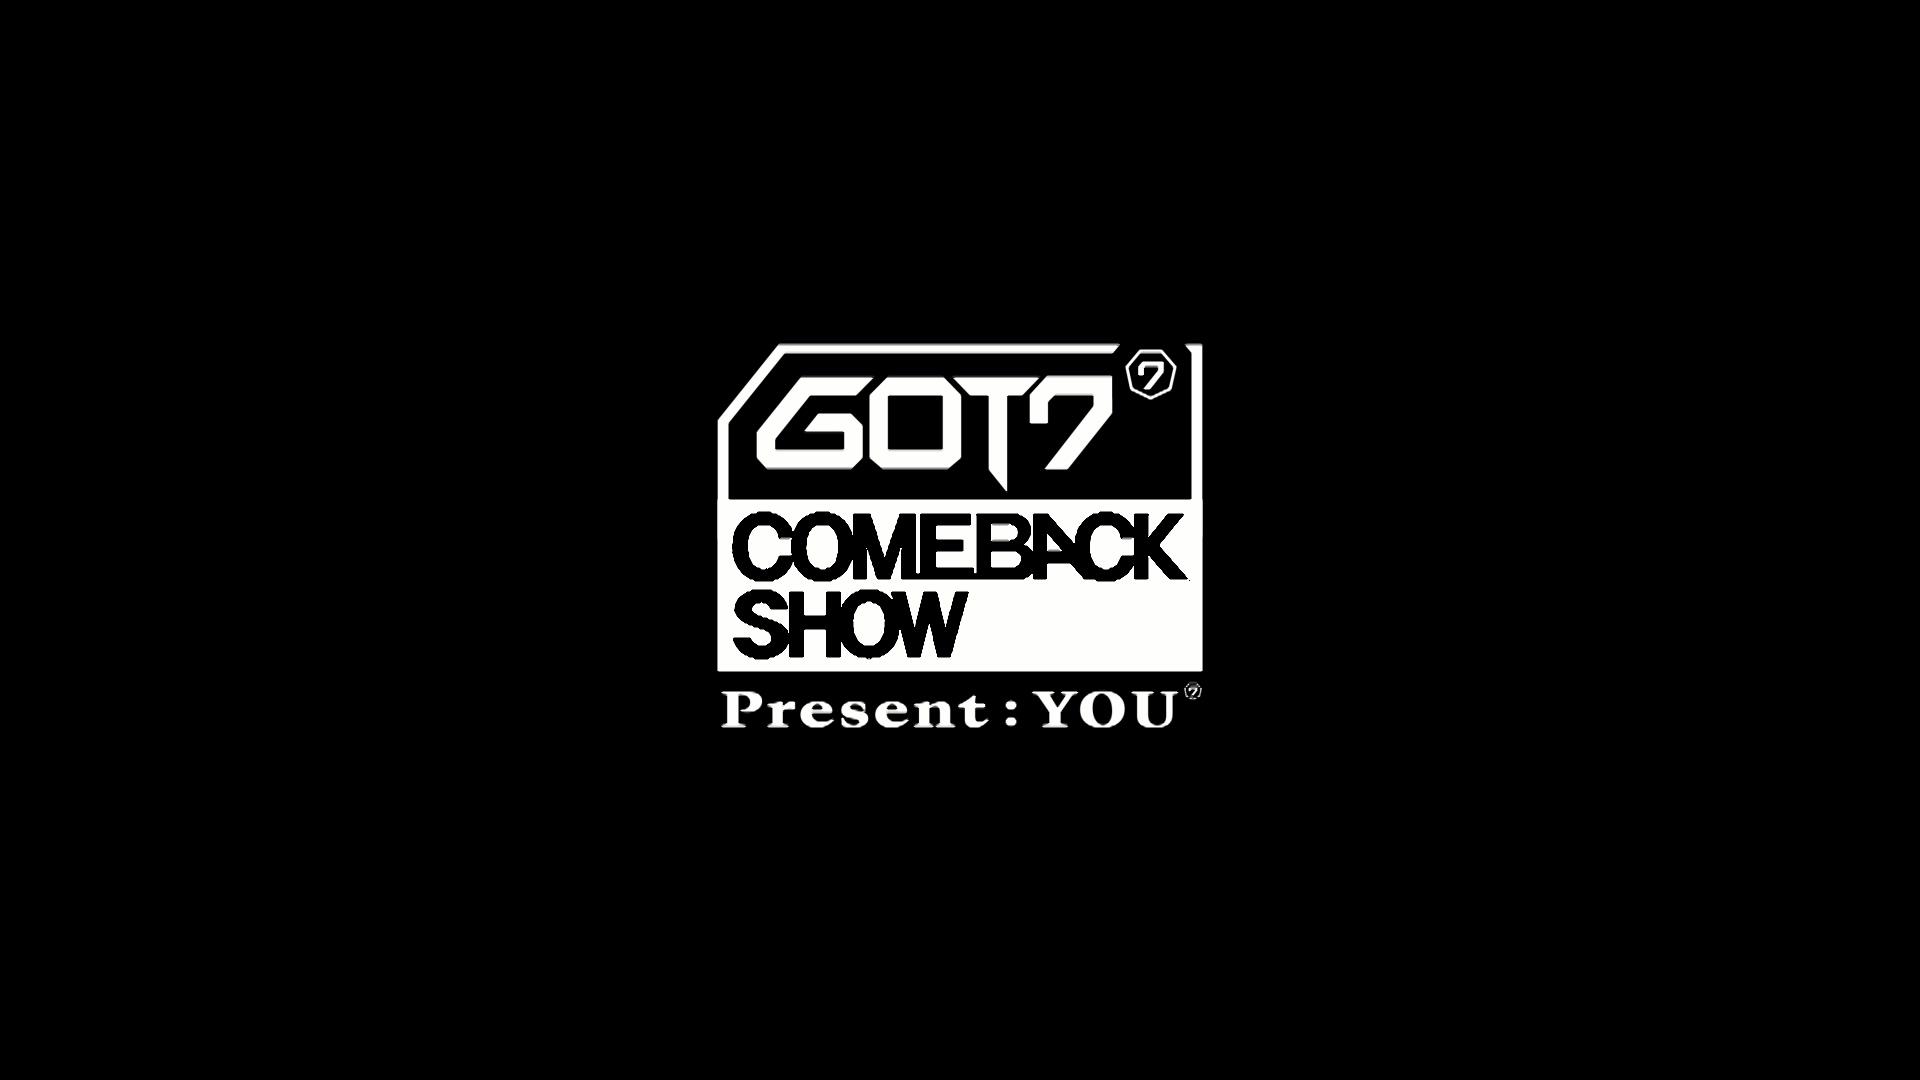 GOT7 COMEBACK SHOW <Present : YOU> Teaser